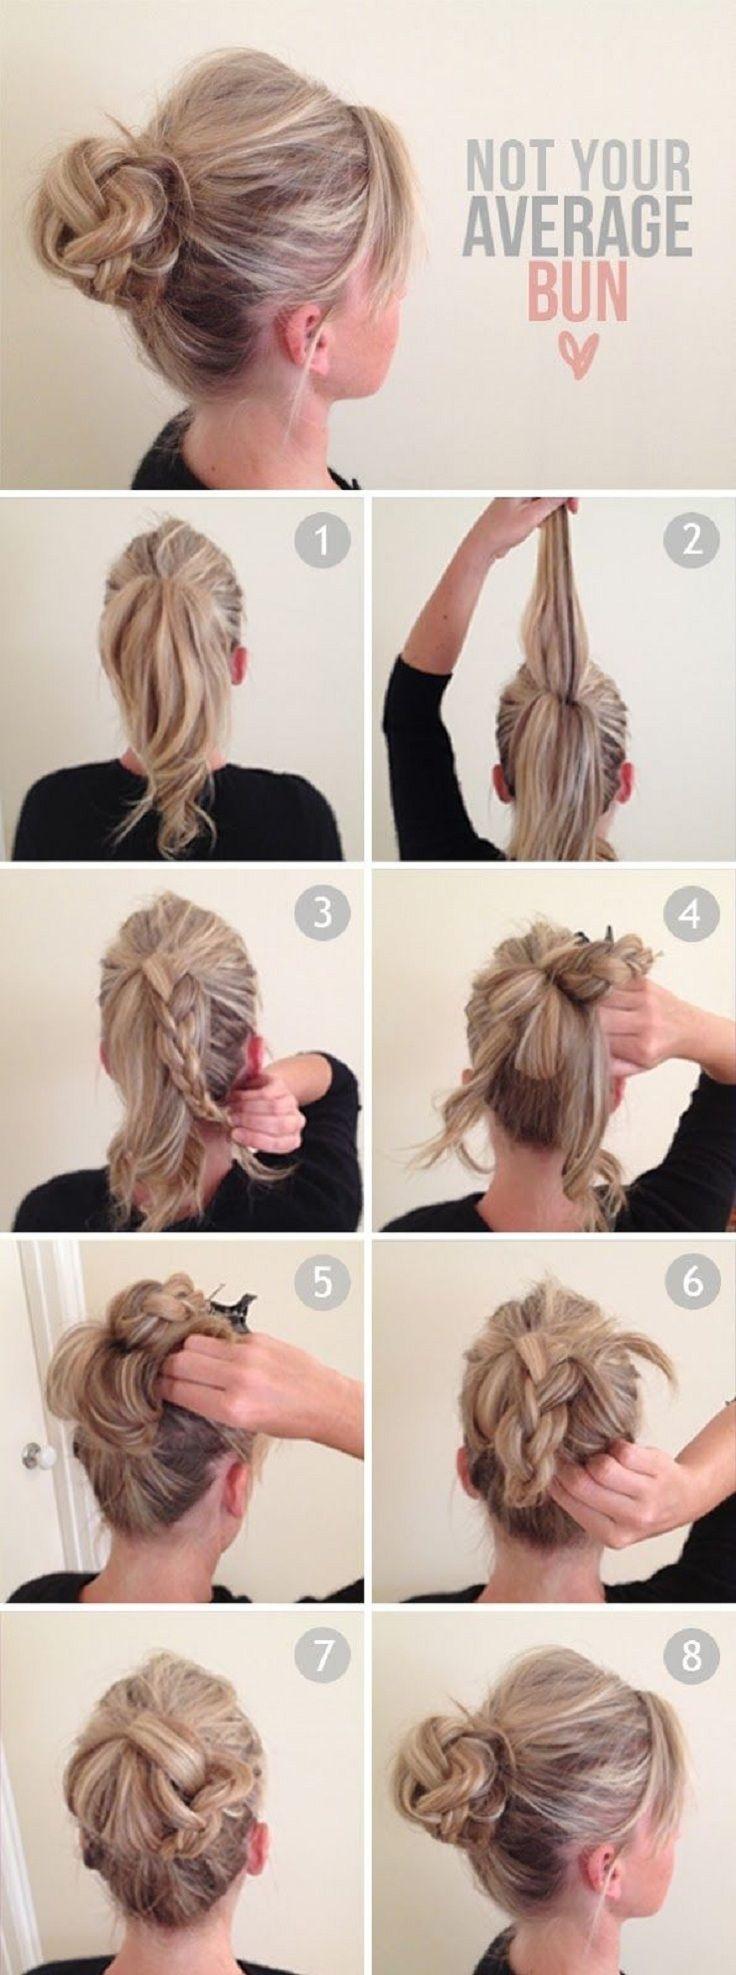 Пучки из волос фото уроки